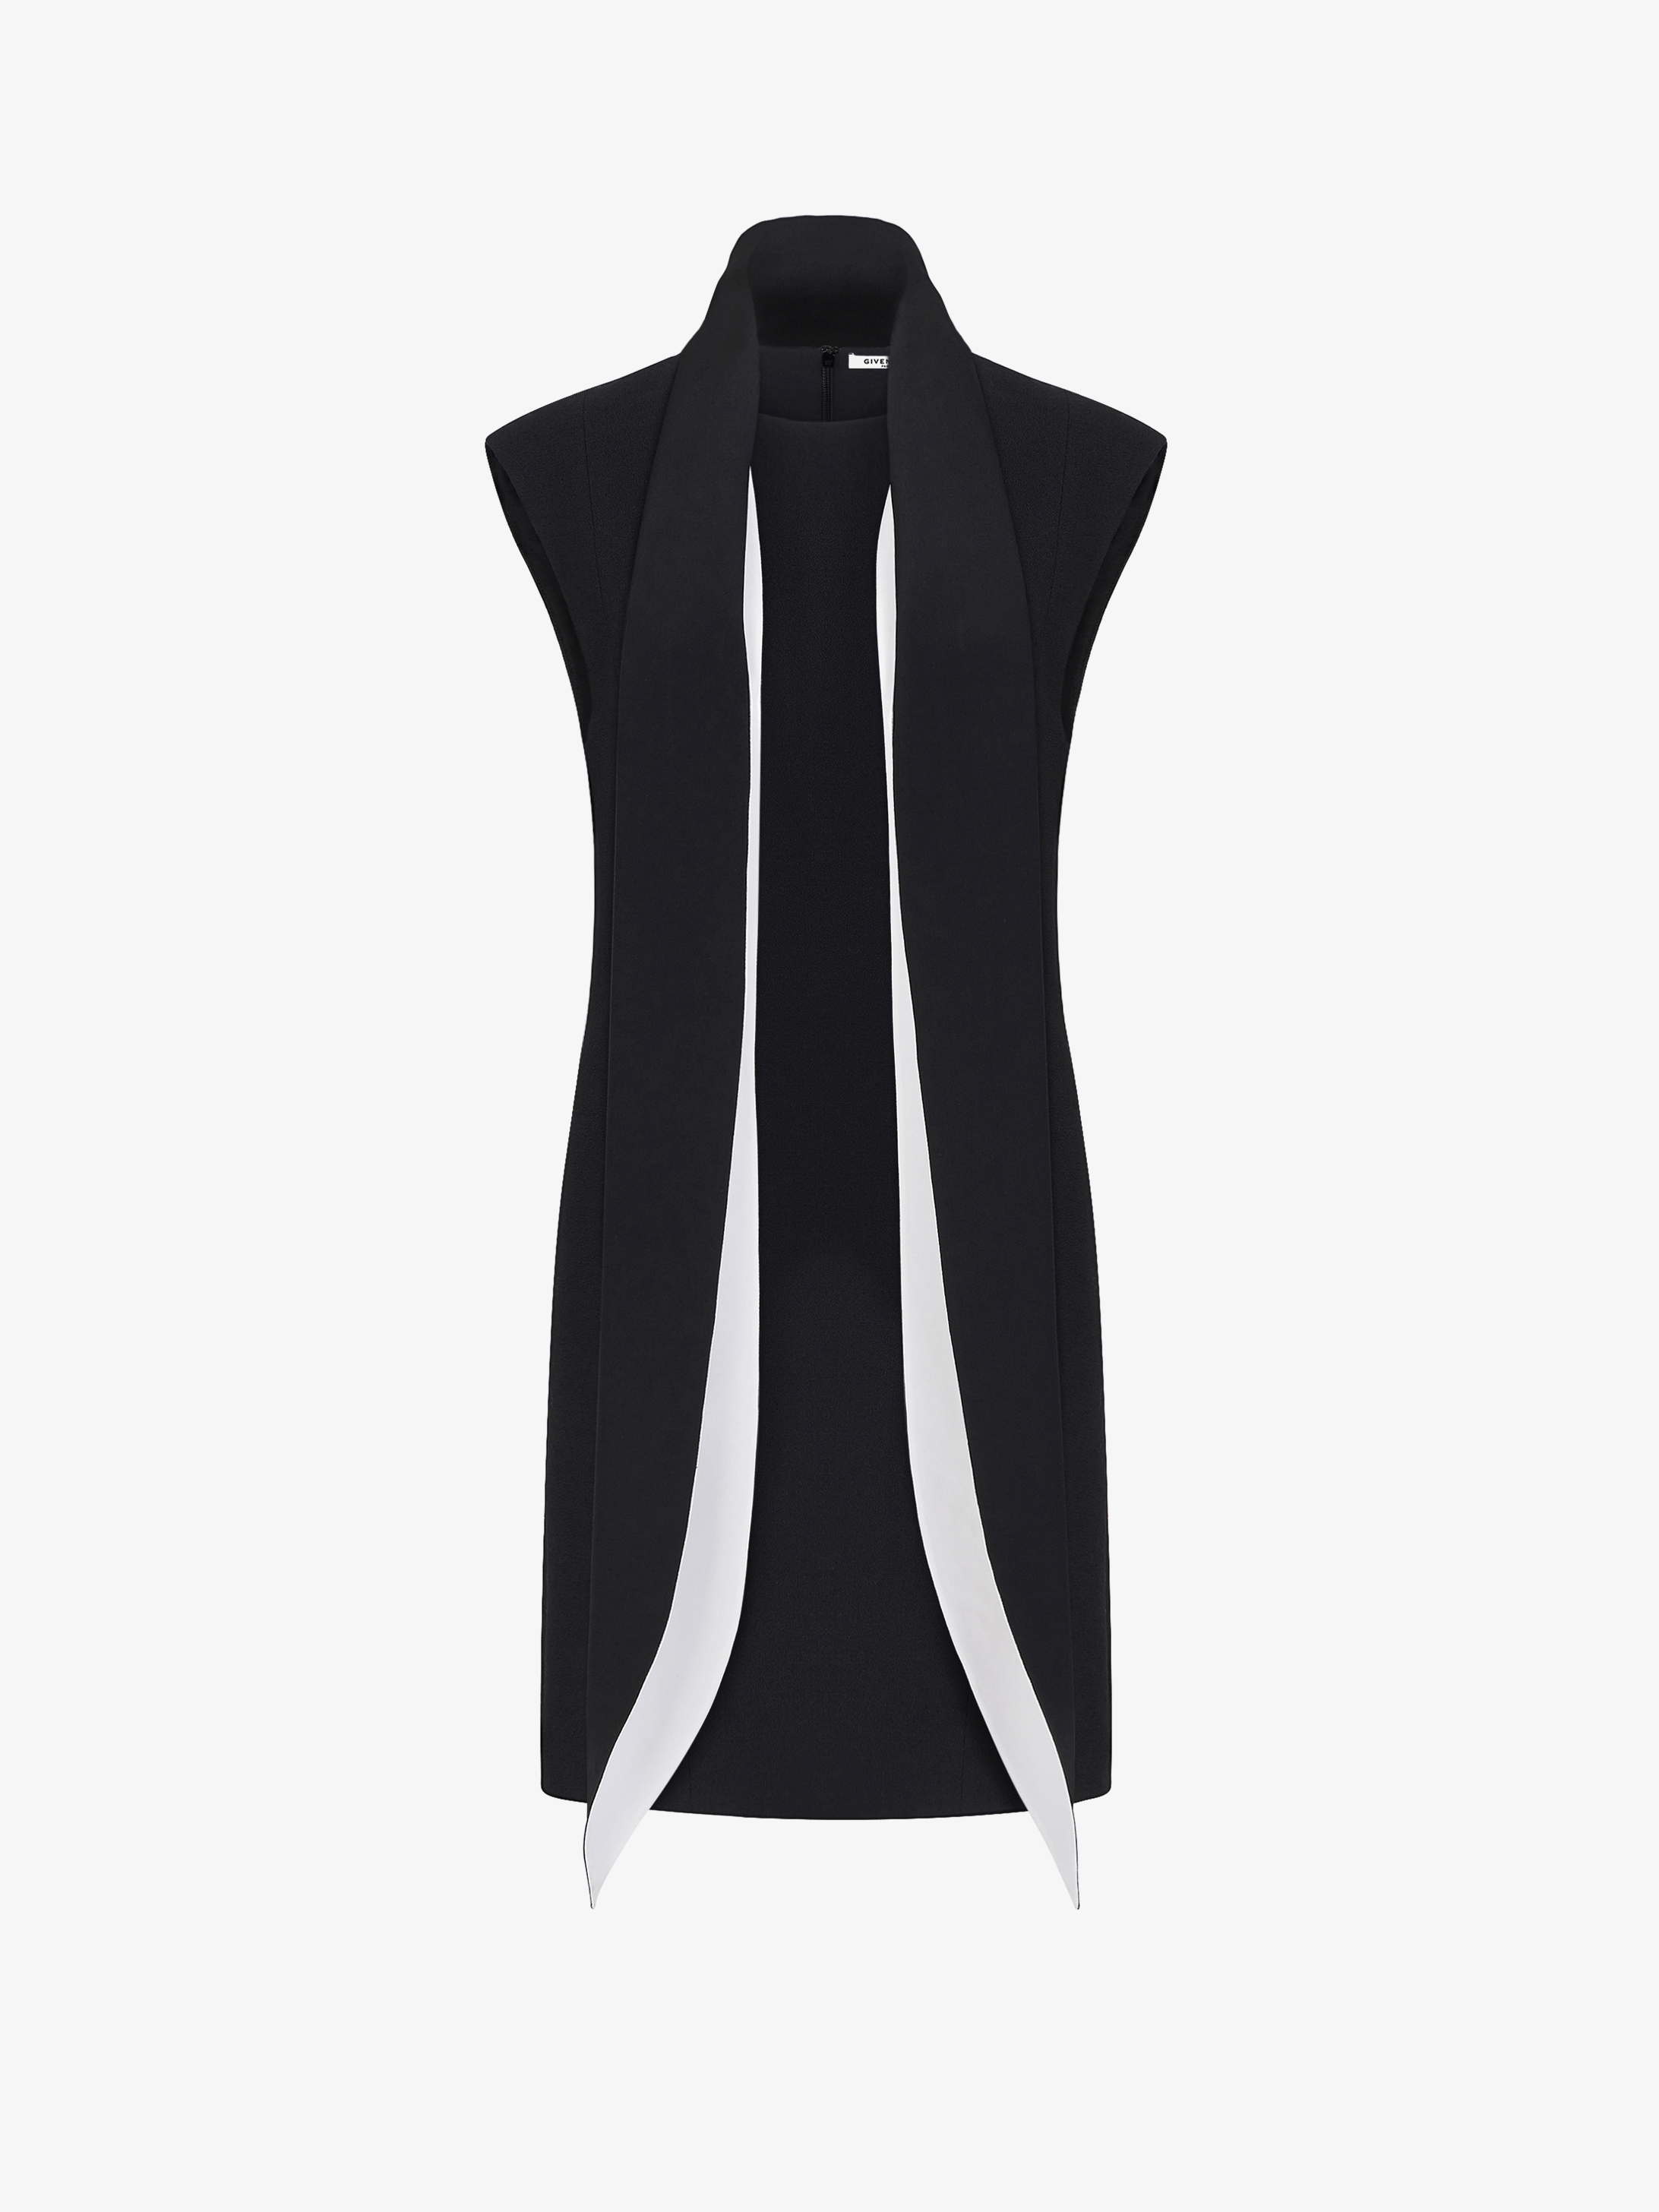 Robe courte à col foulard contrasté